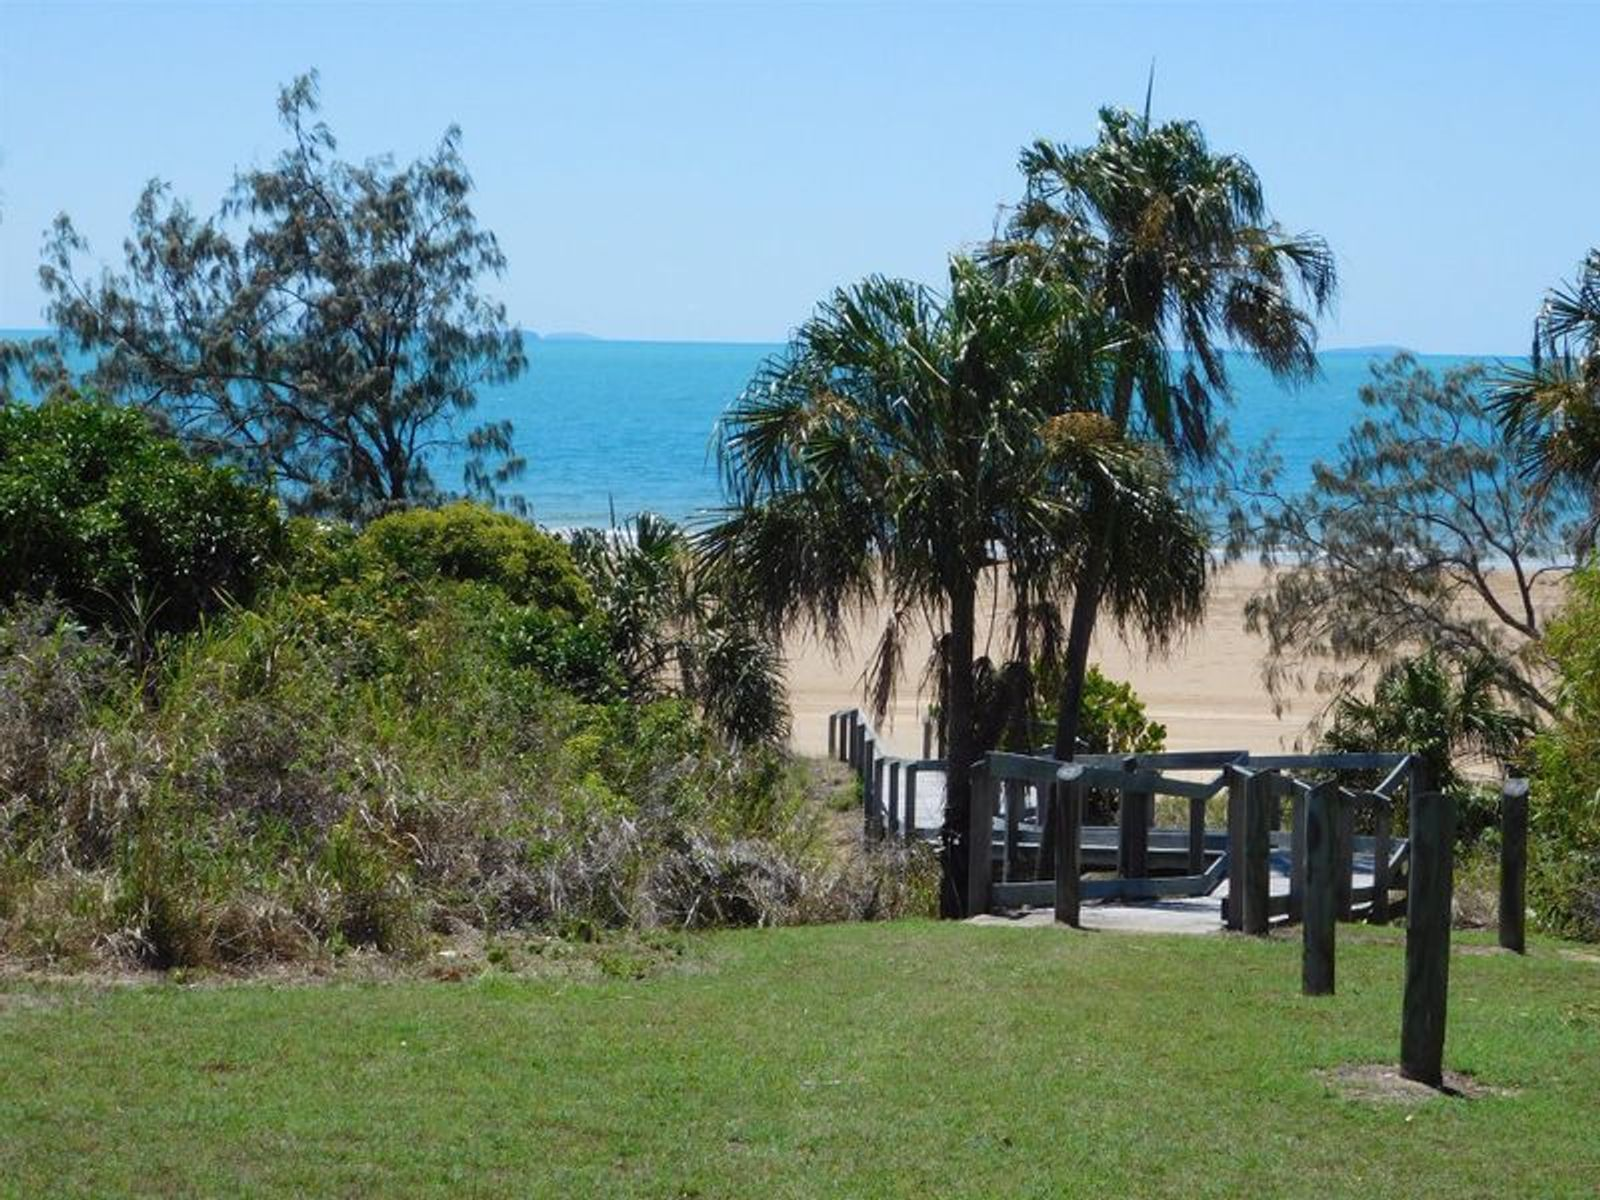 Lot 8/8 Howlands Road, Ilbilbie, QLD 4738